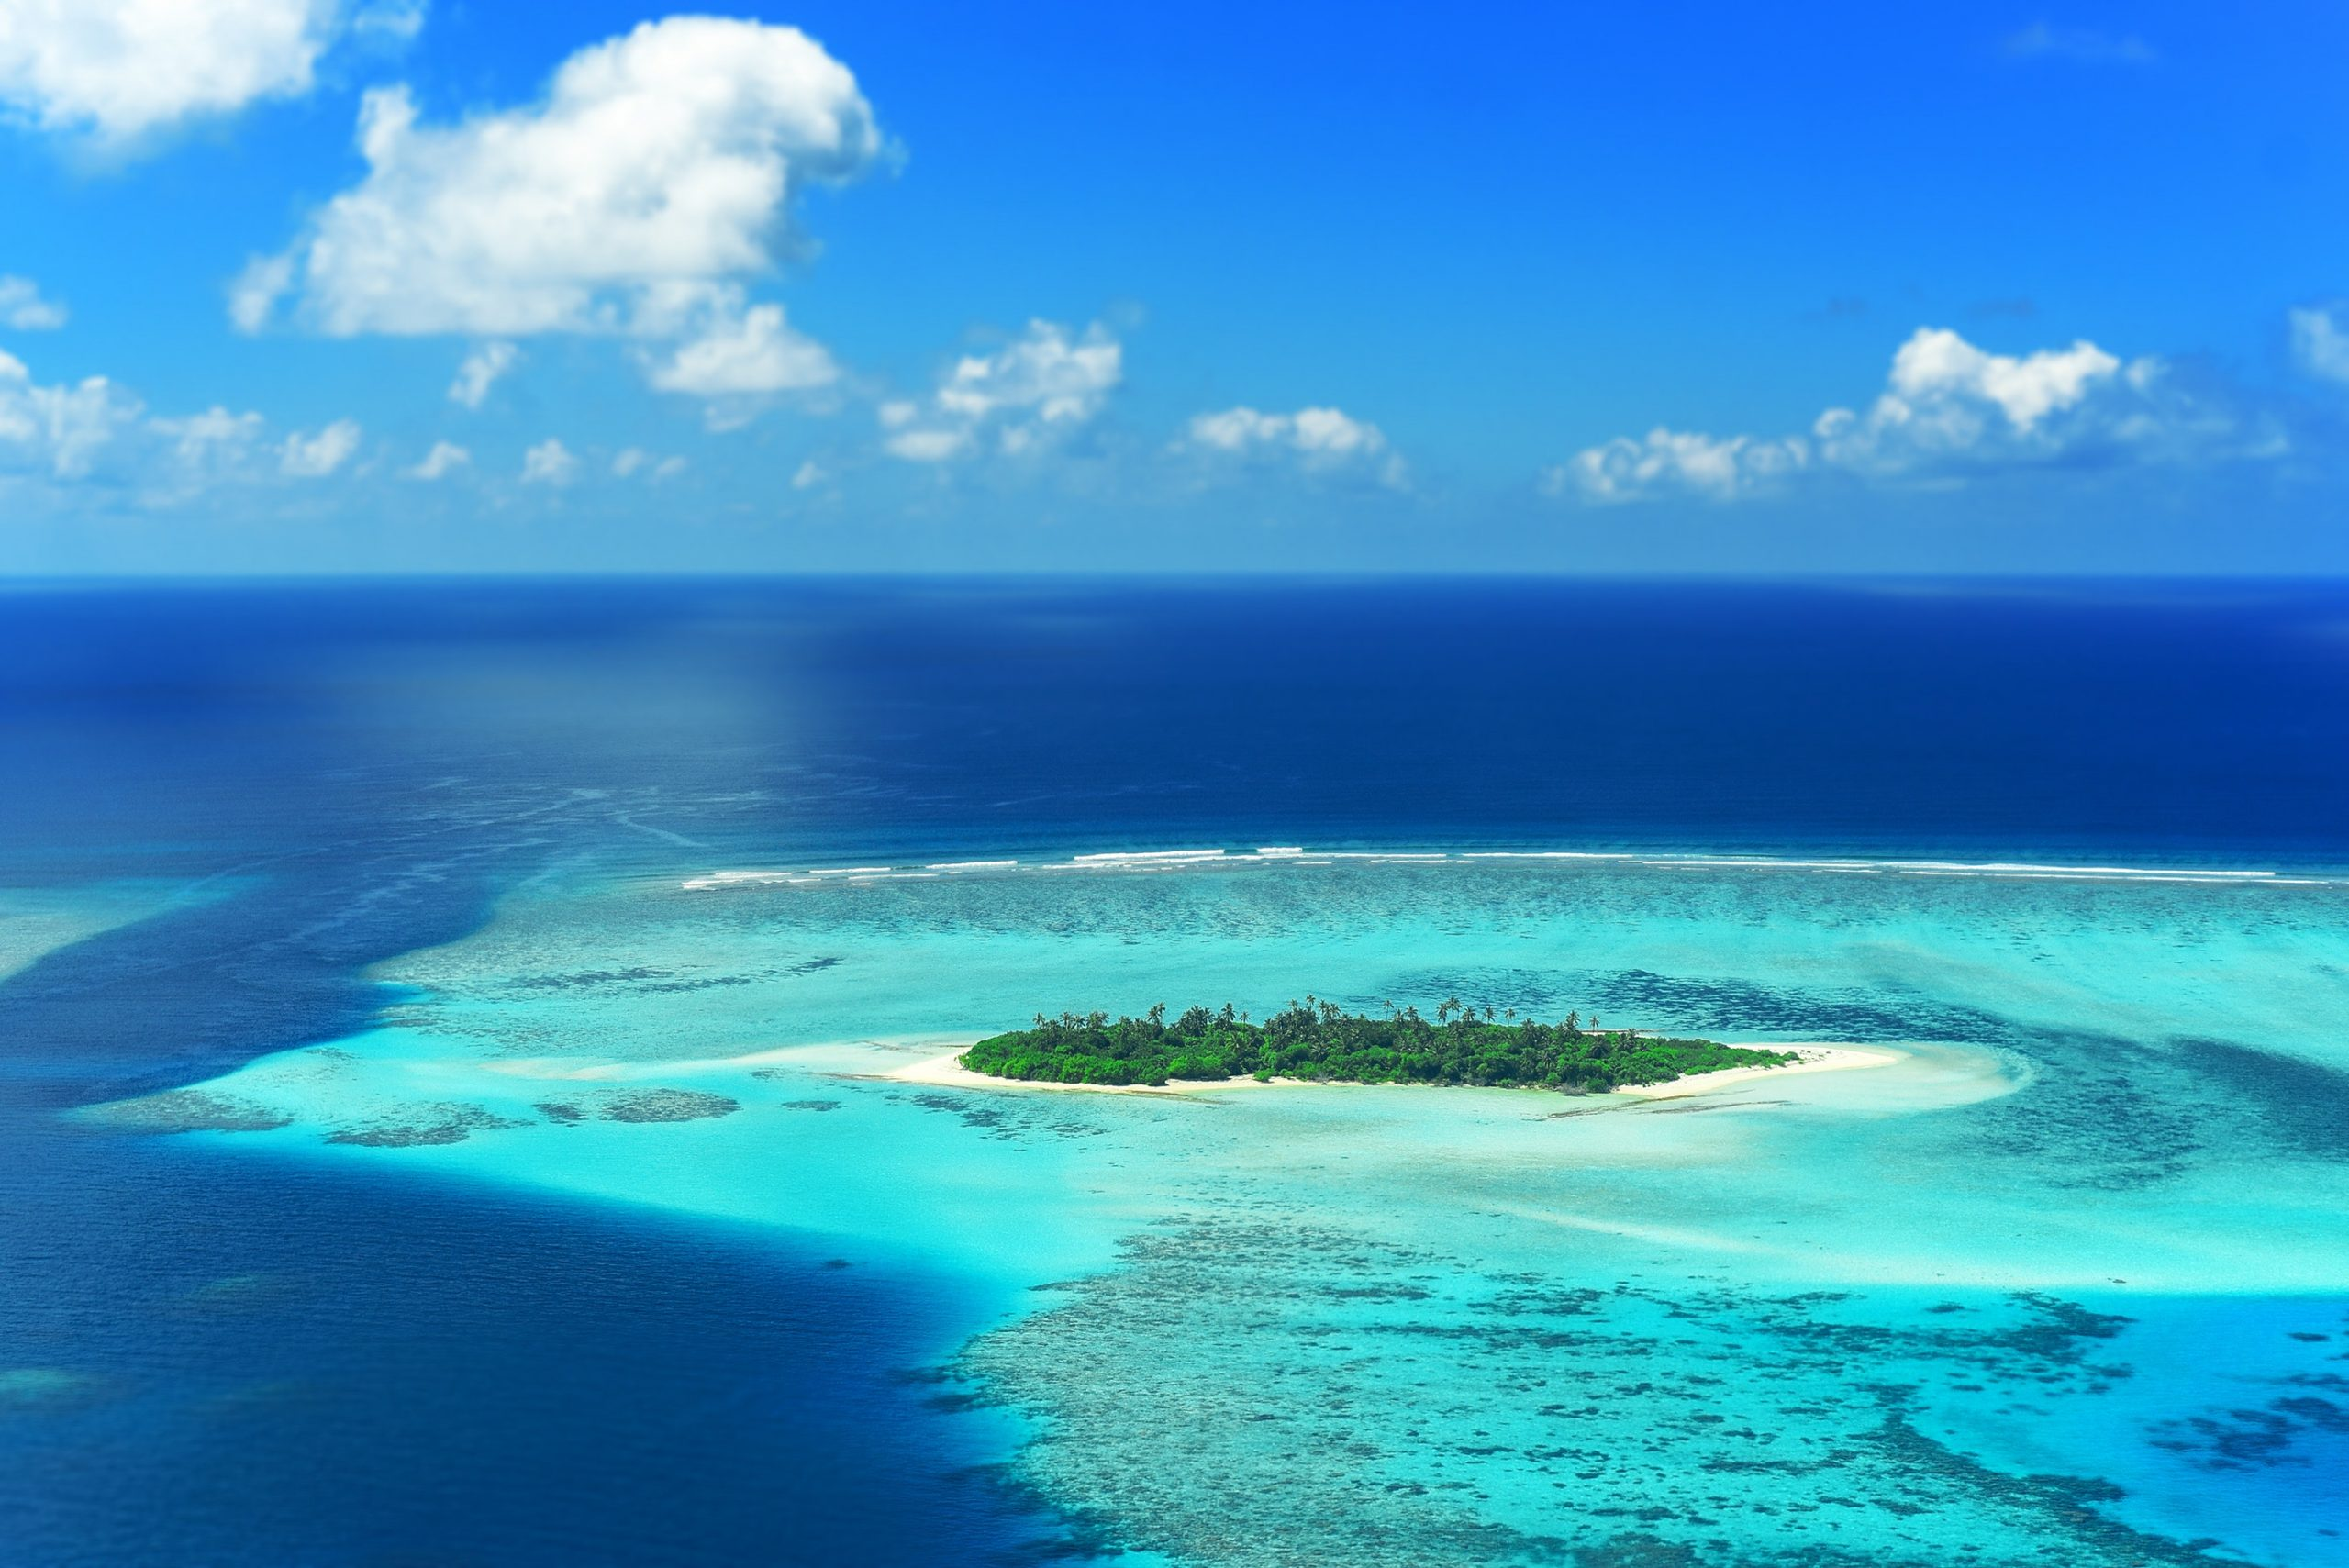 Lagoon Maldives